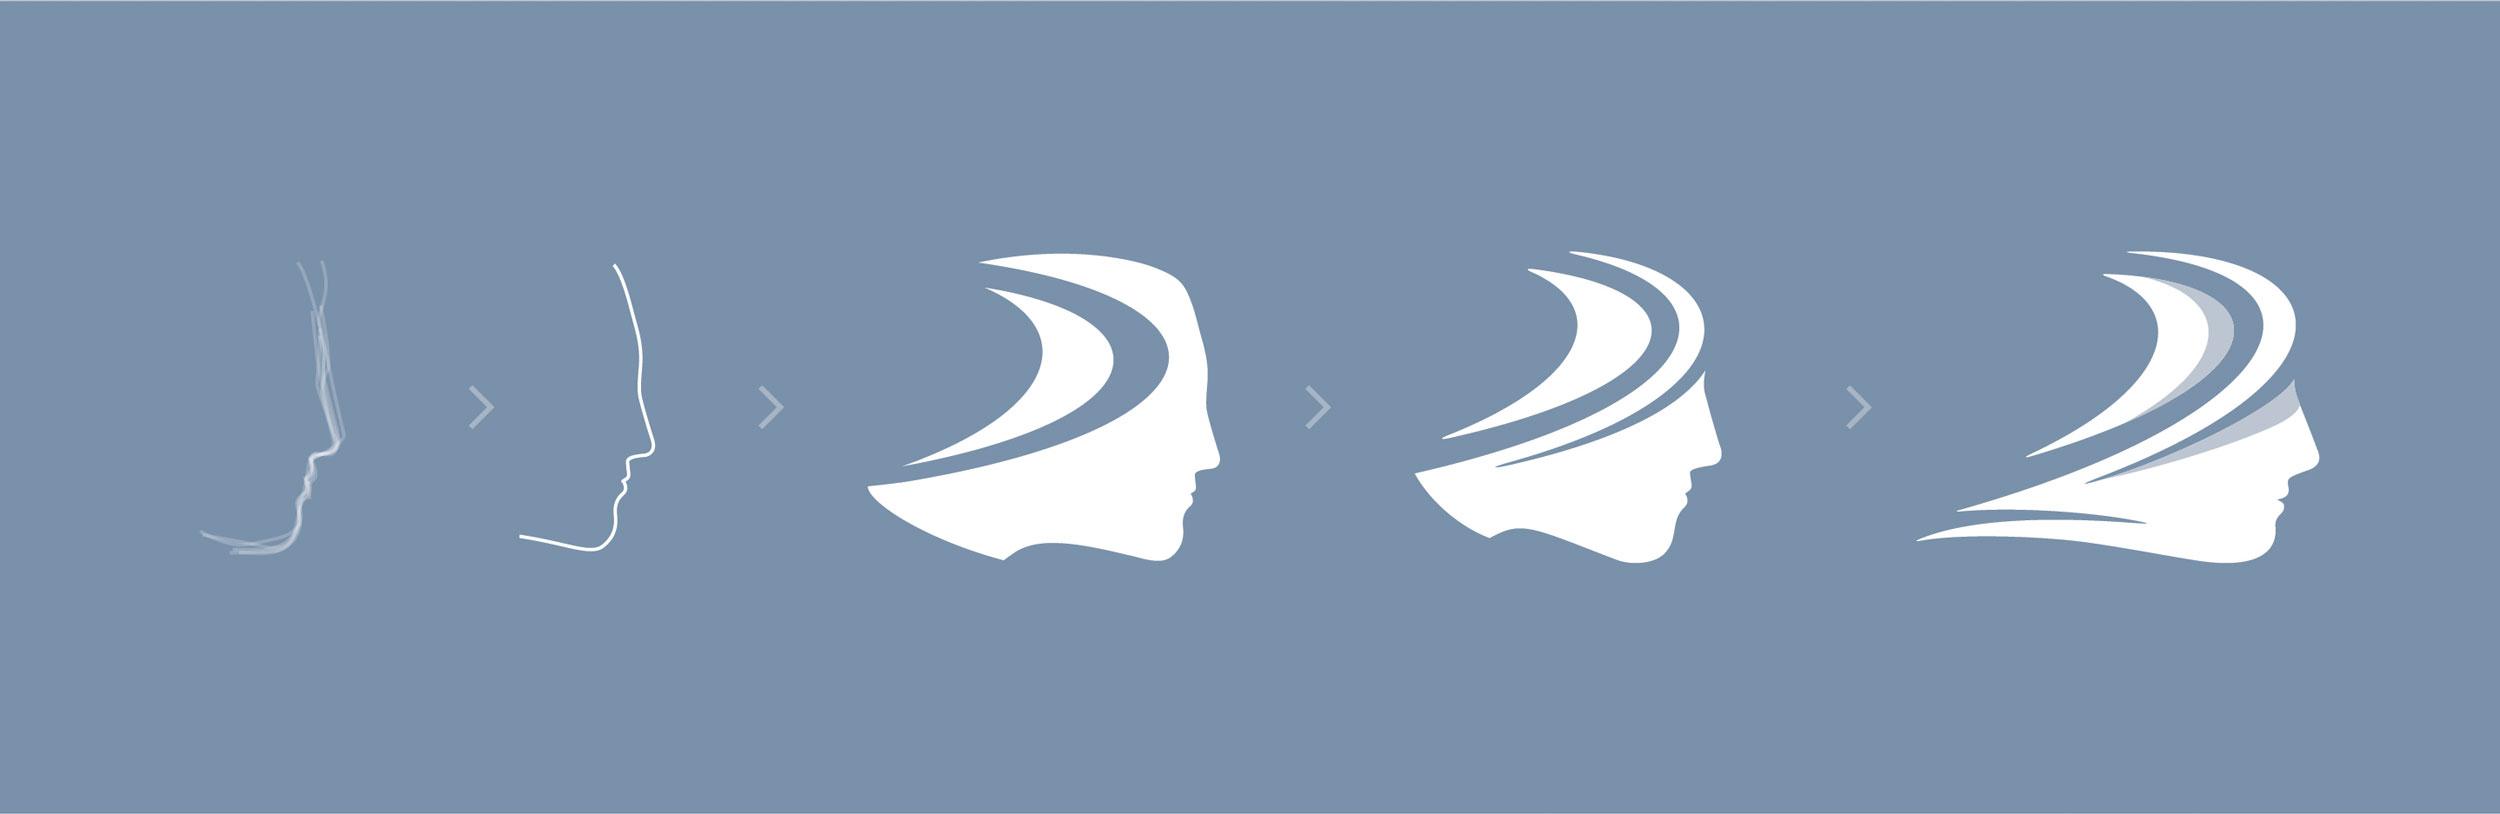 Logo construction and evolution for the Association for Applied Sport Psychology logo mark.Image copyright Jeff Miller, HellothisisJeff Design LLC